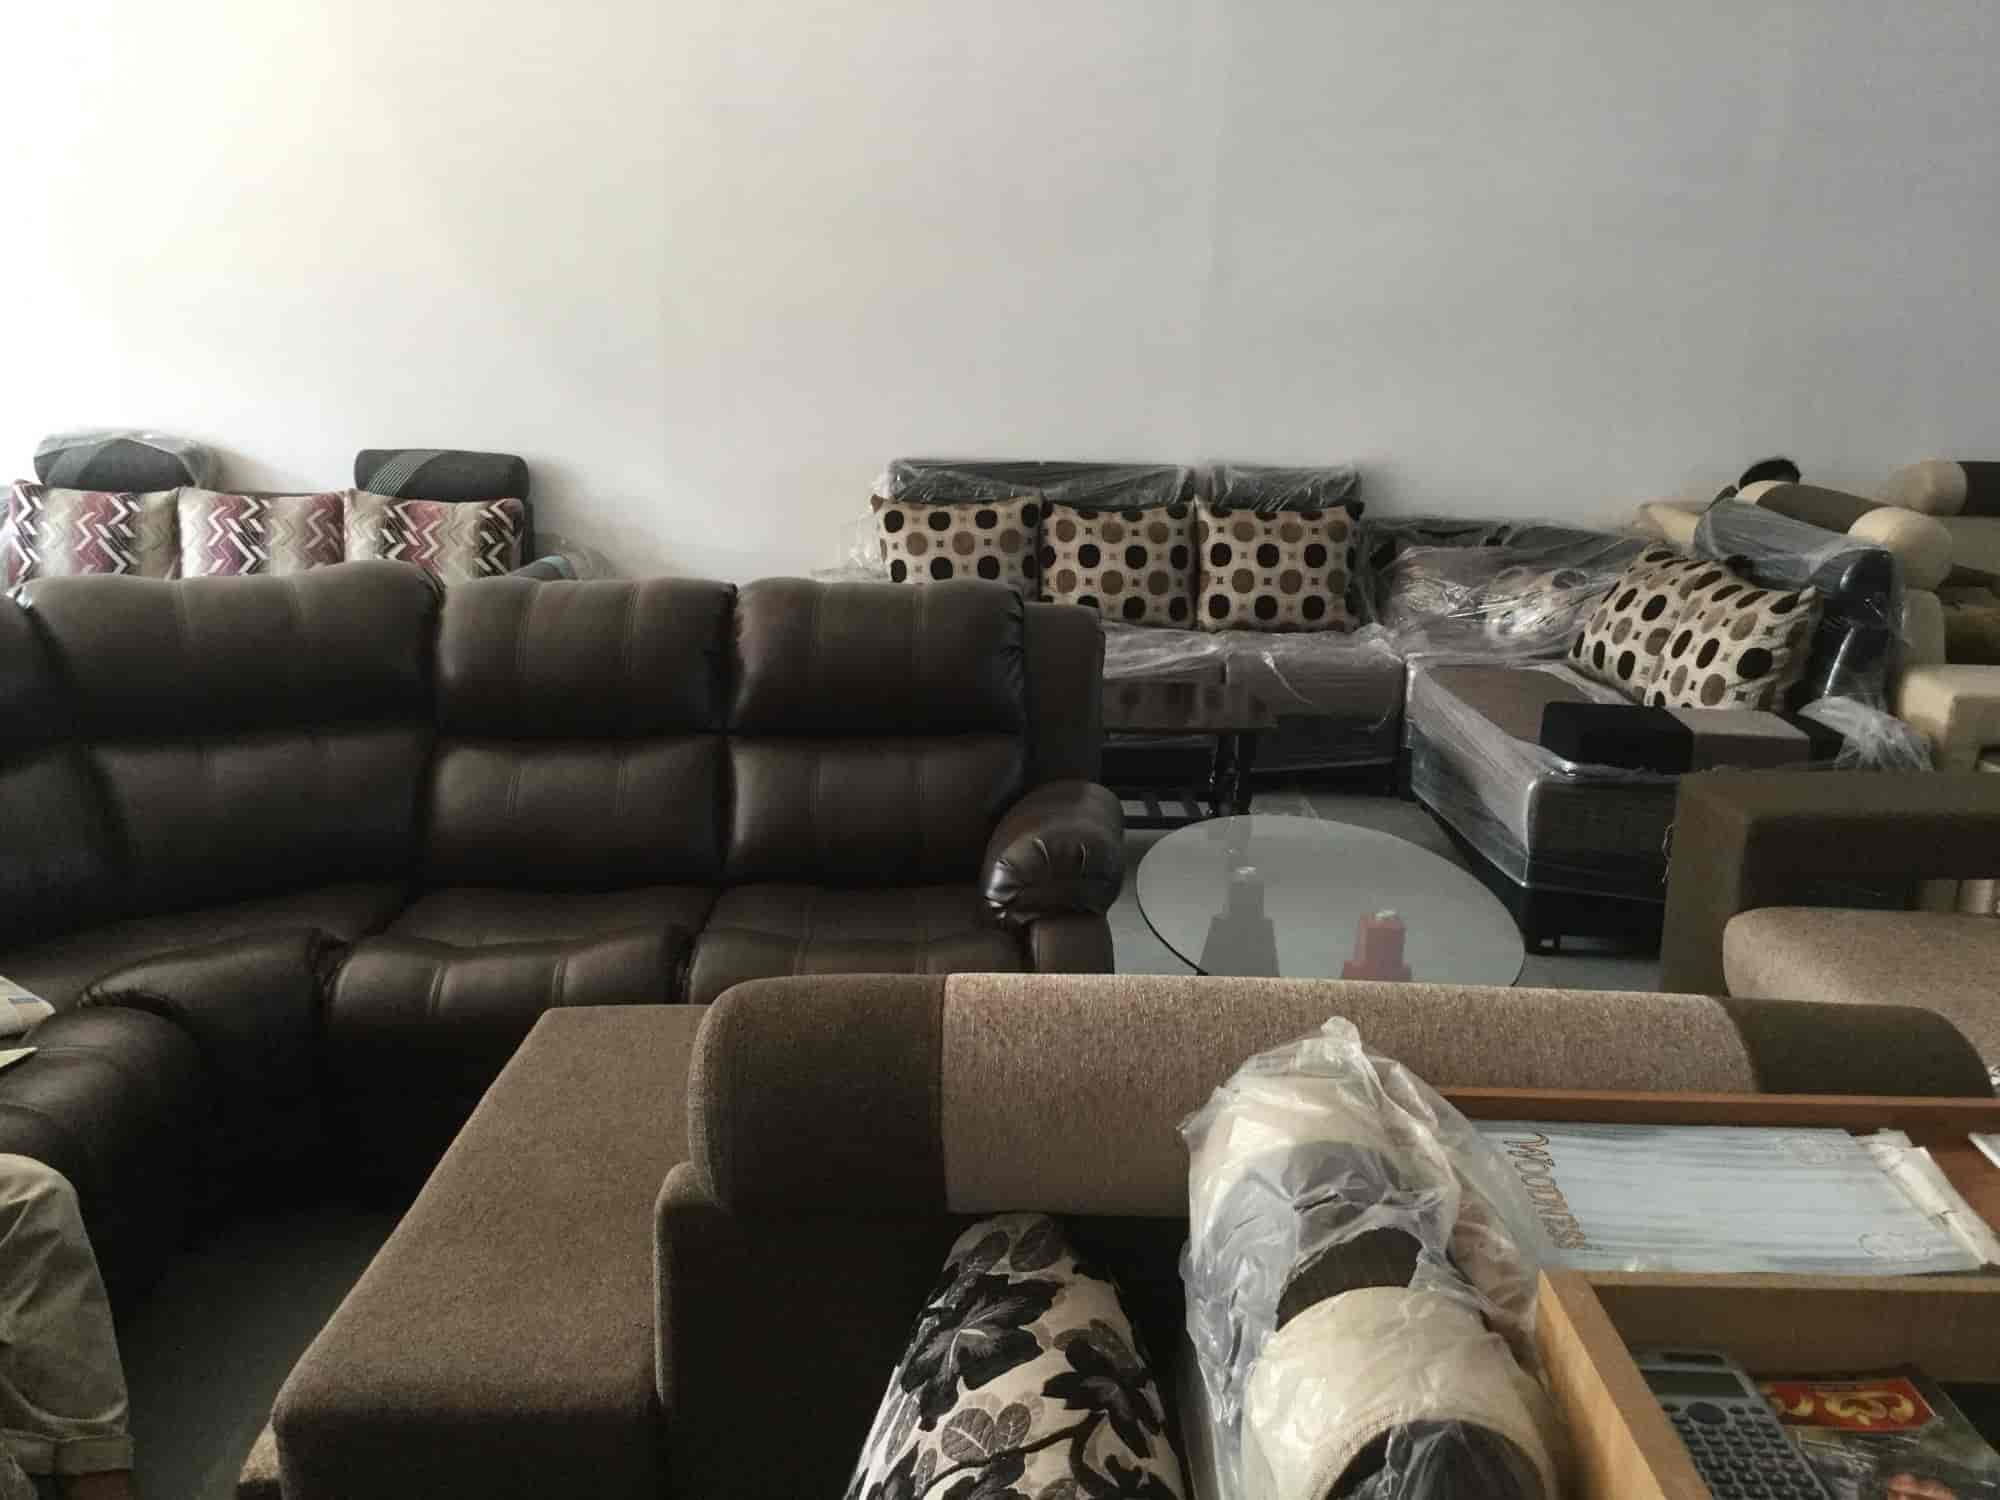 mohsin furniture, hsr layout sector 1 - furniture dealers in